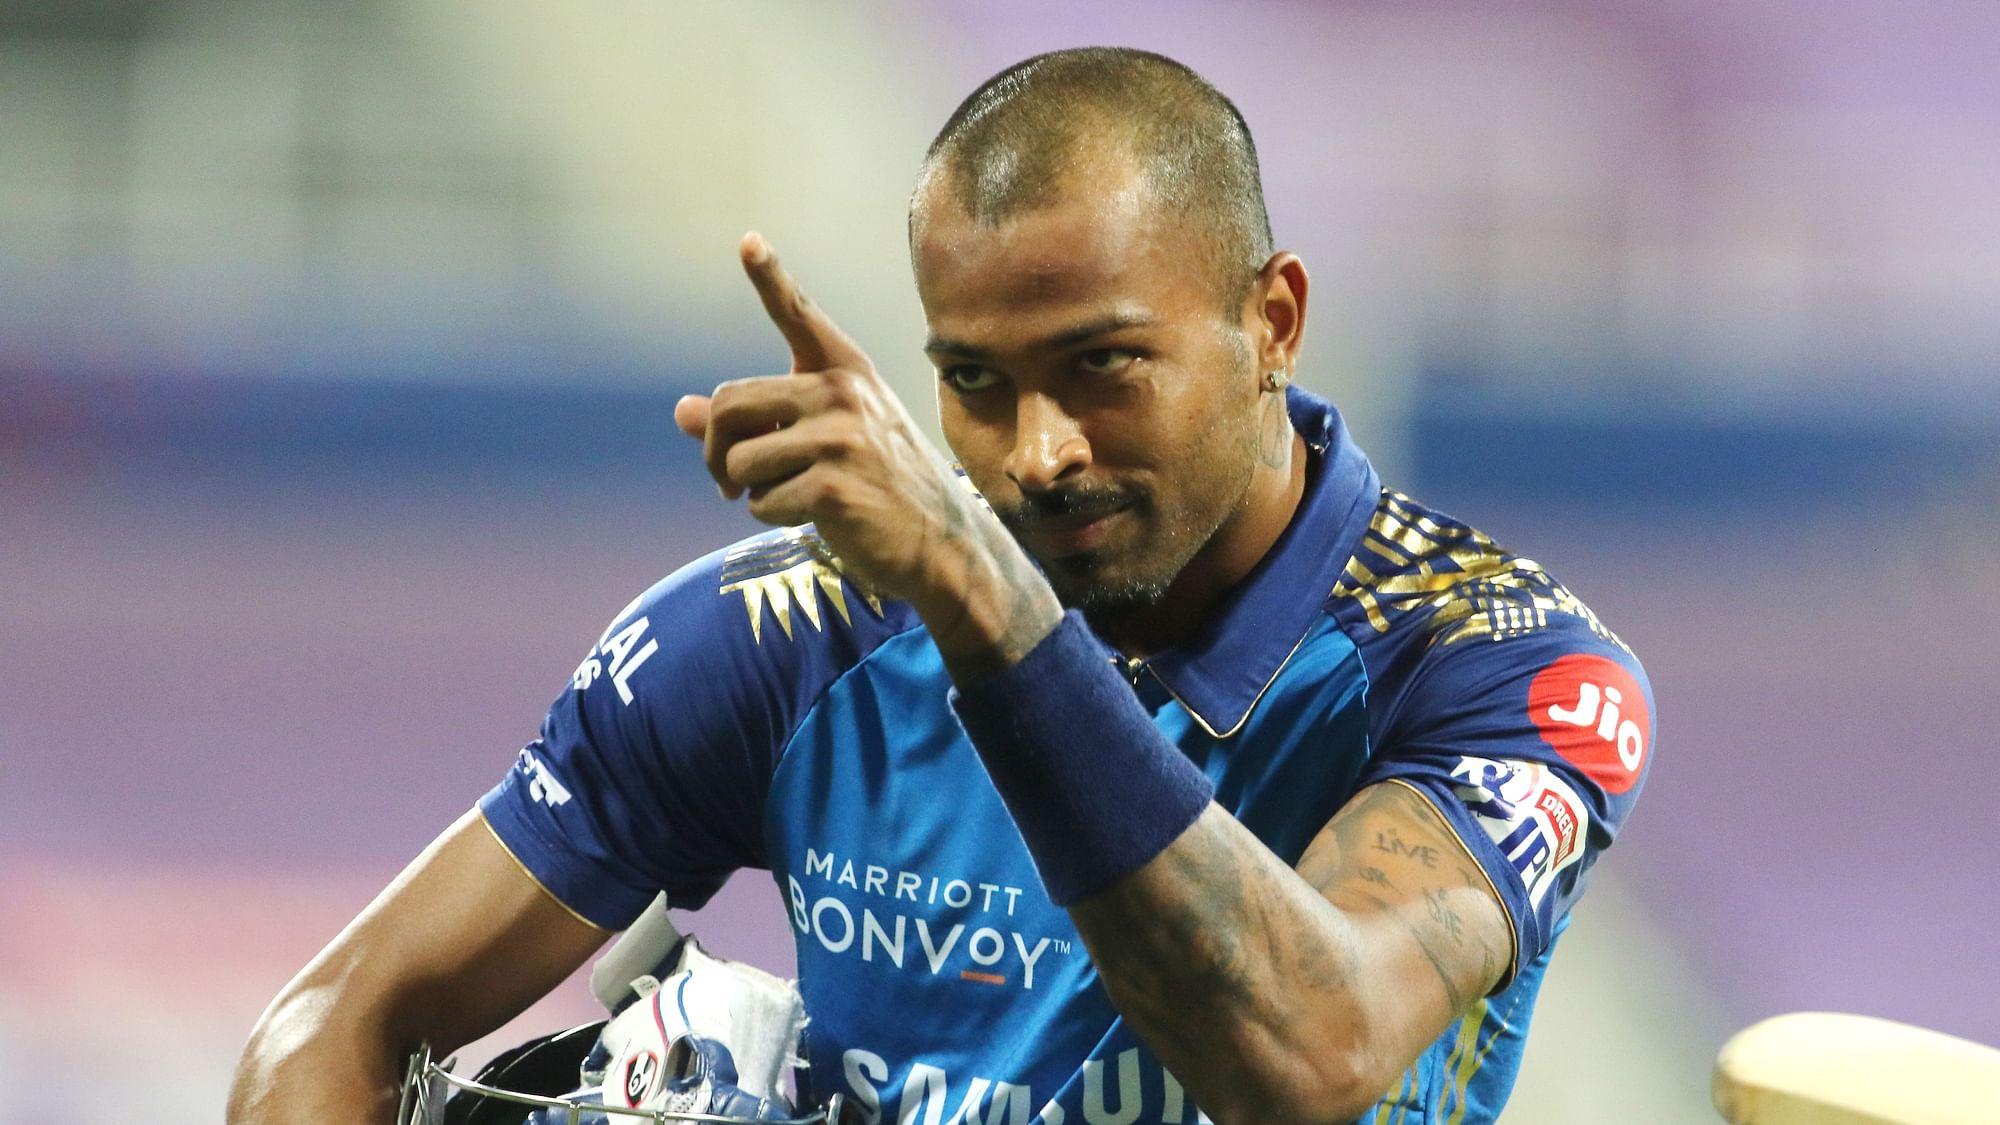 Hardik Pandya Smashes 60 off 21 as Mumbai Recover to Post 195/5